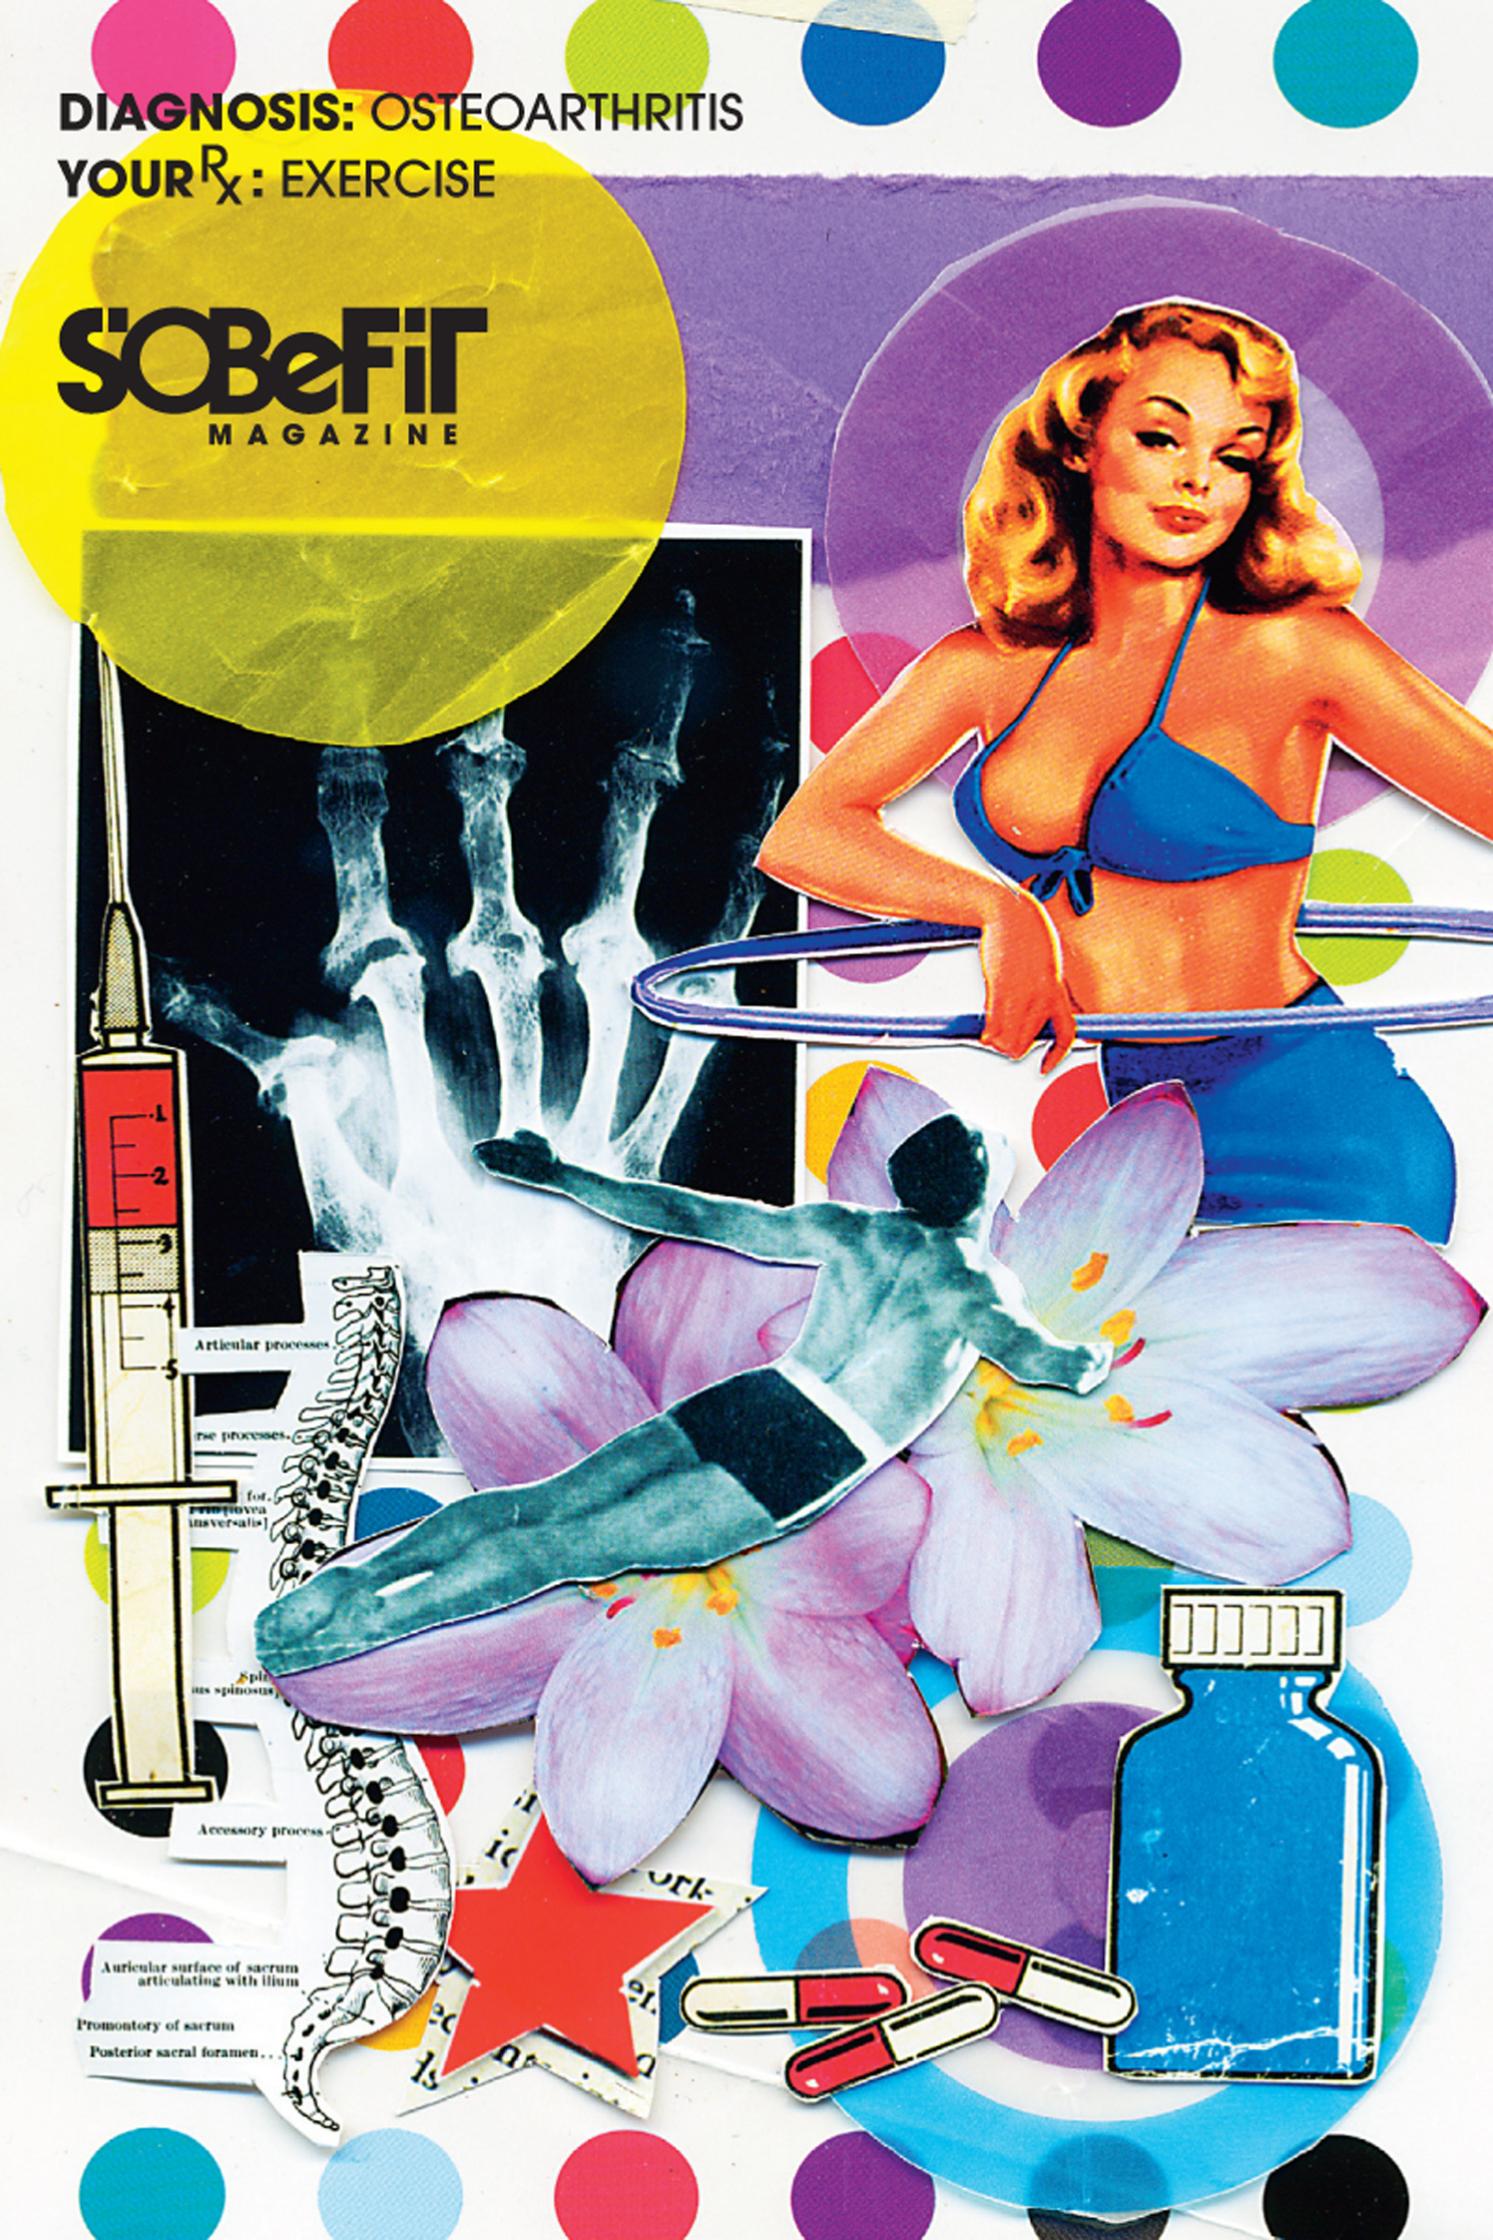 SoBeFit Osteoarthritis